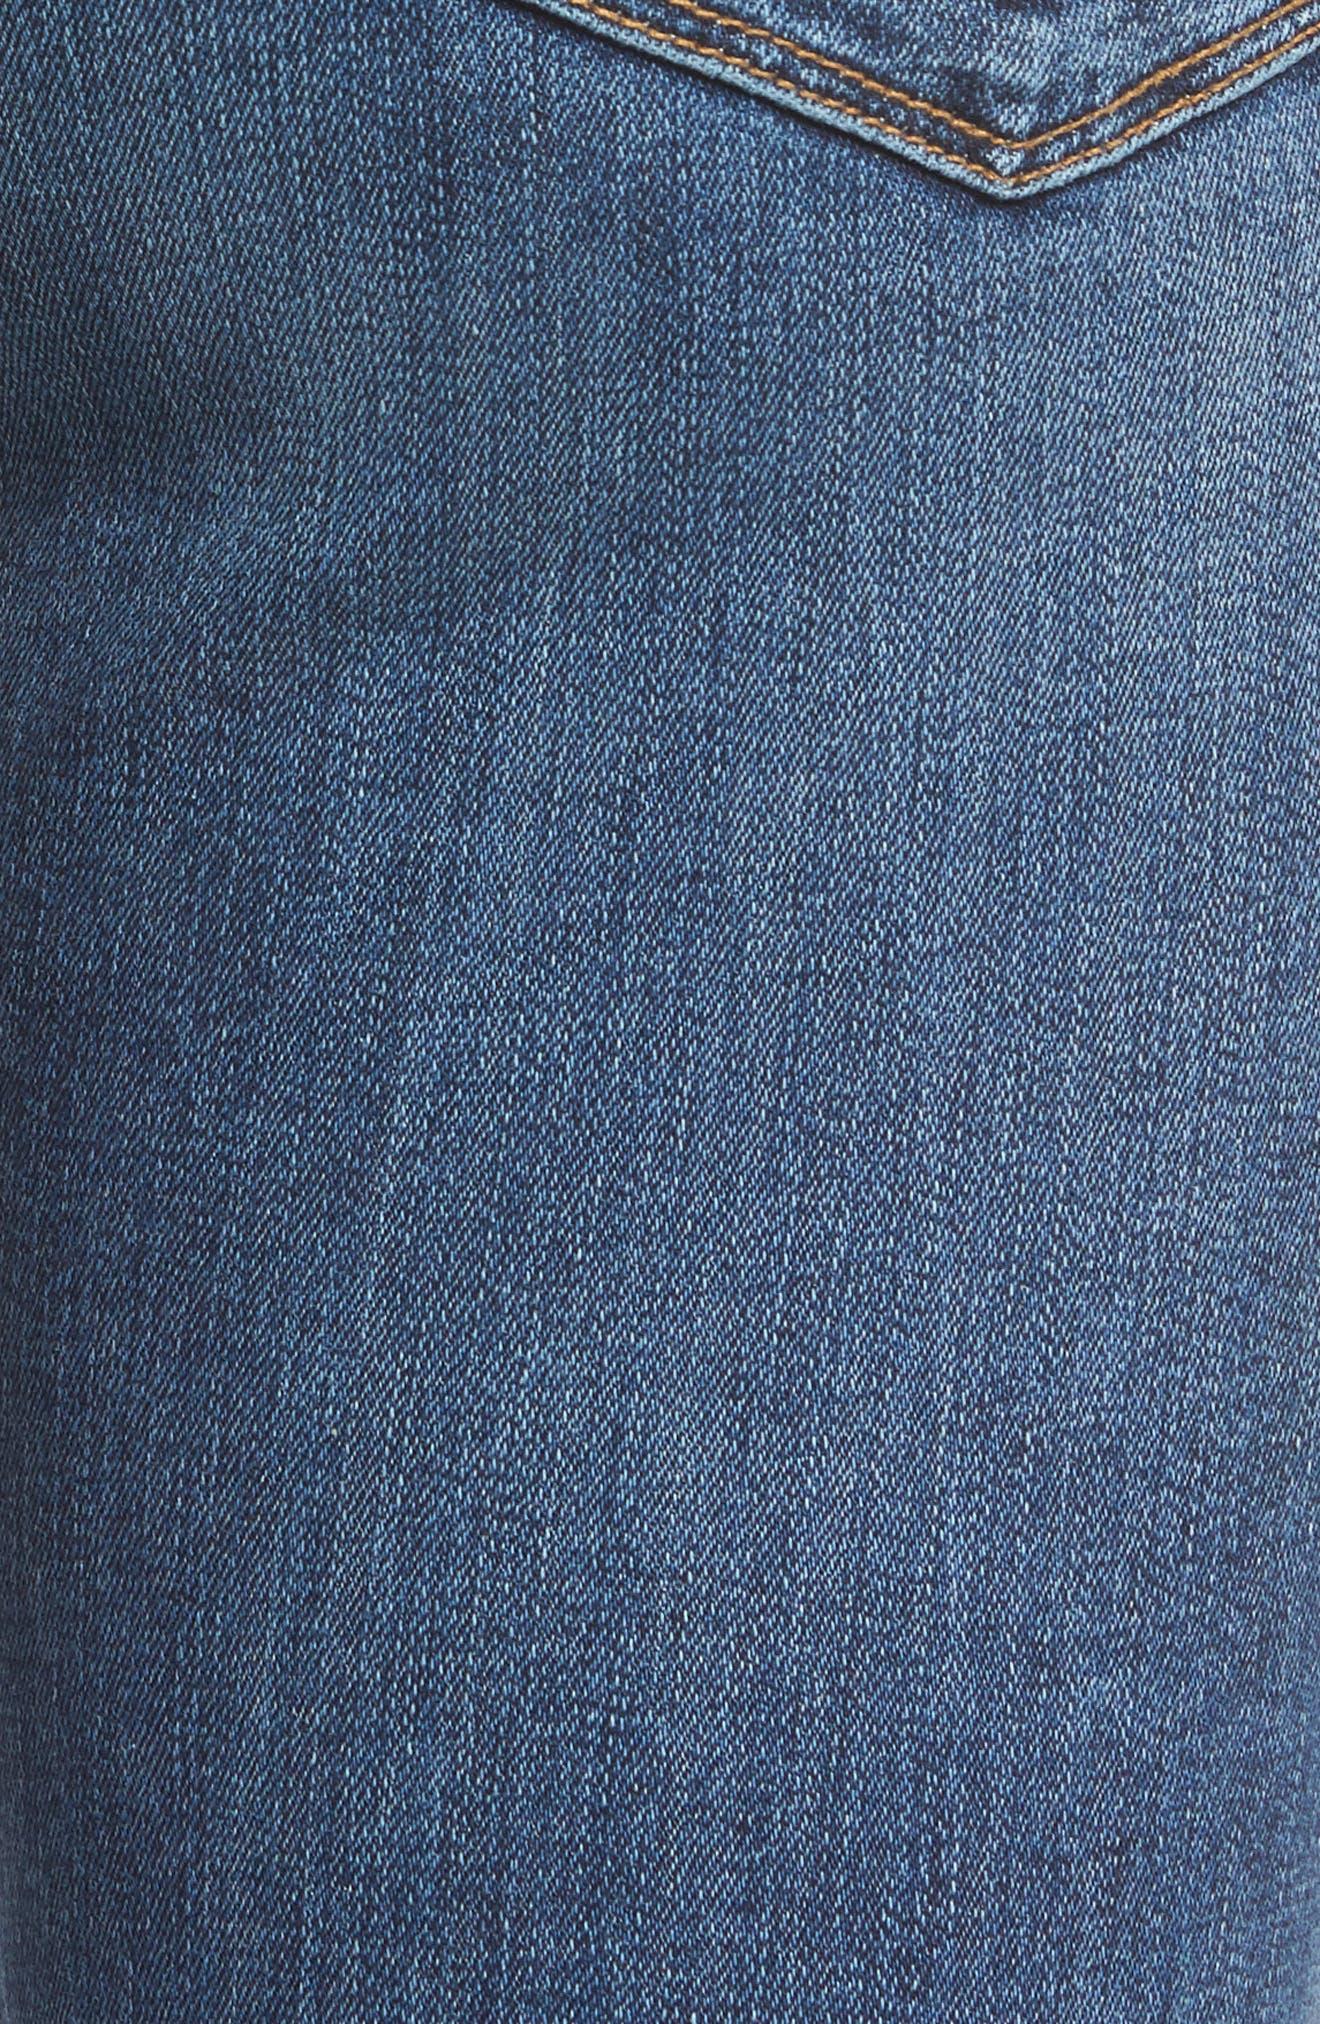 Tally Unfamed Hem Skinny Jeans,                             Alternate thumbnail 19, color,